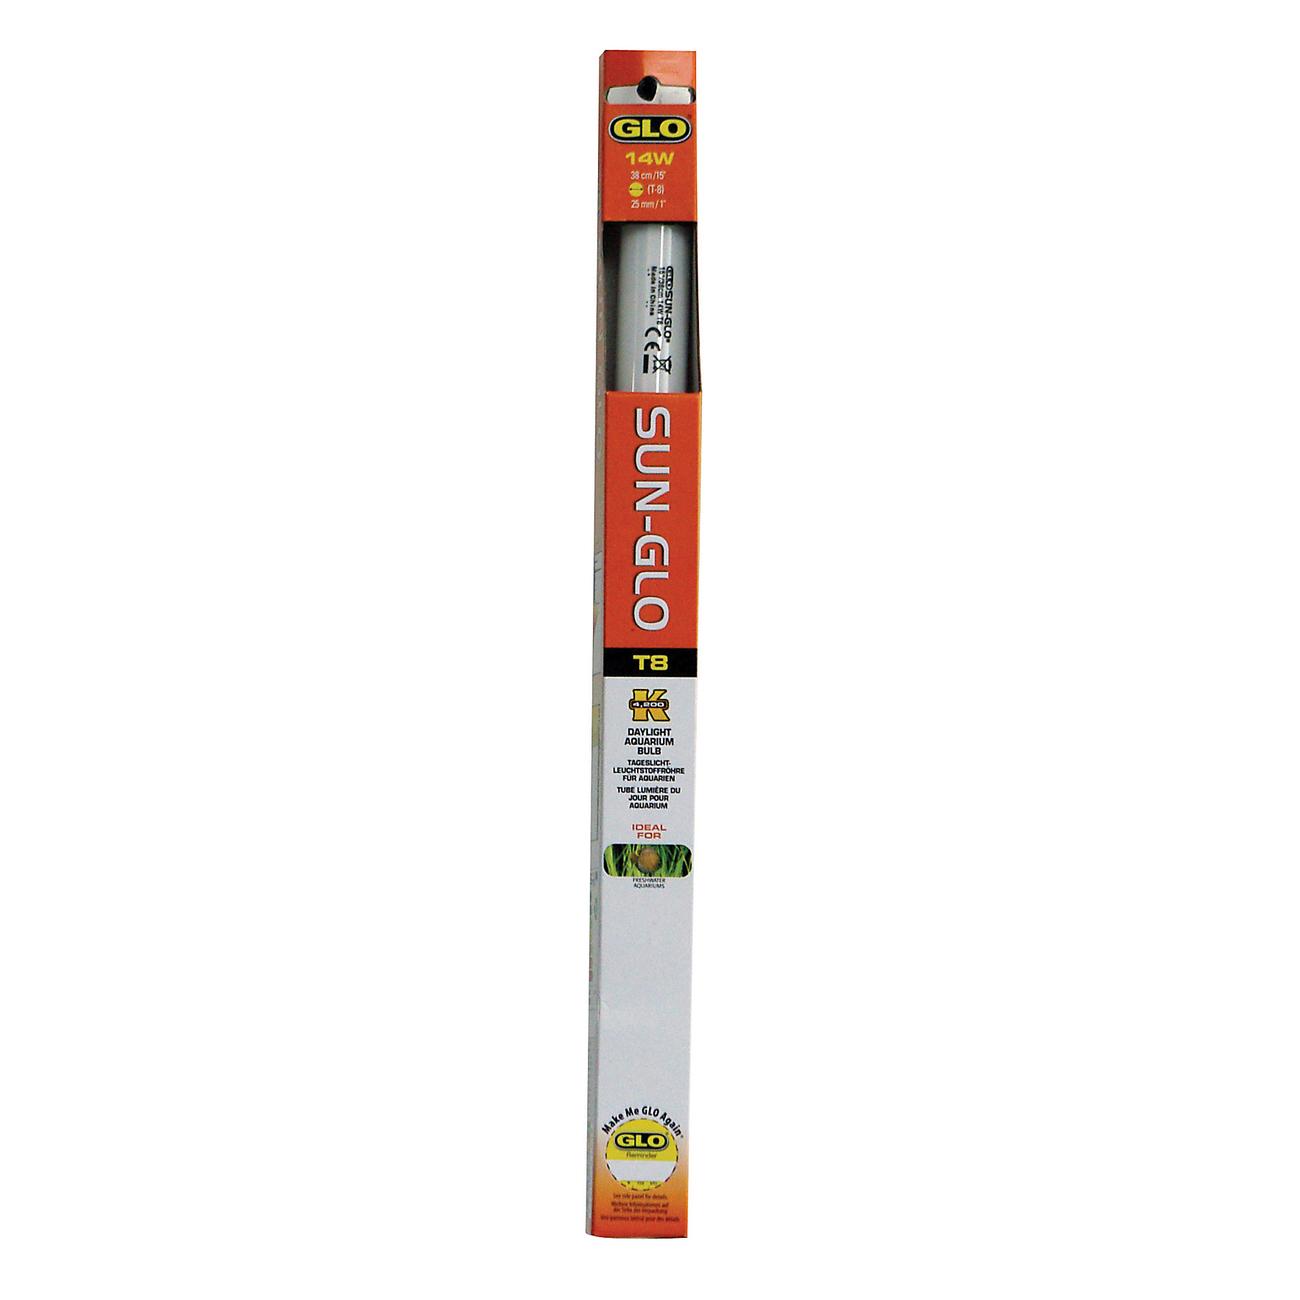 Hagen GLO Sun-Glo Leuchtstoffröhre, 14 W - 2,6 x 38,0 x 2,6 cm